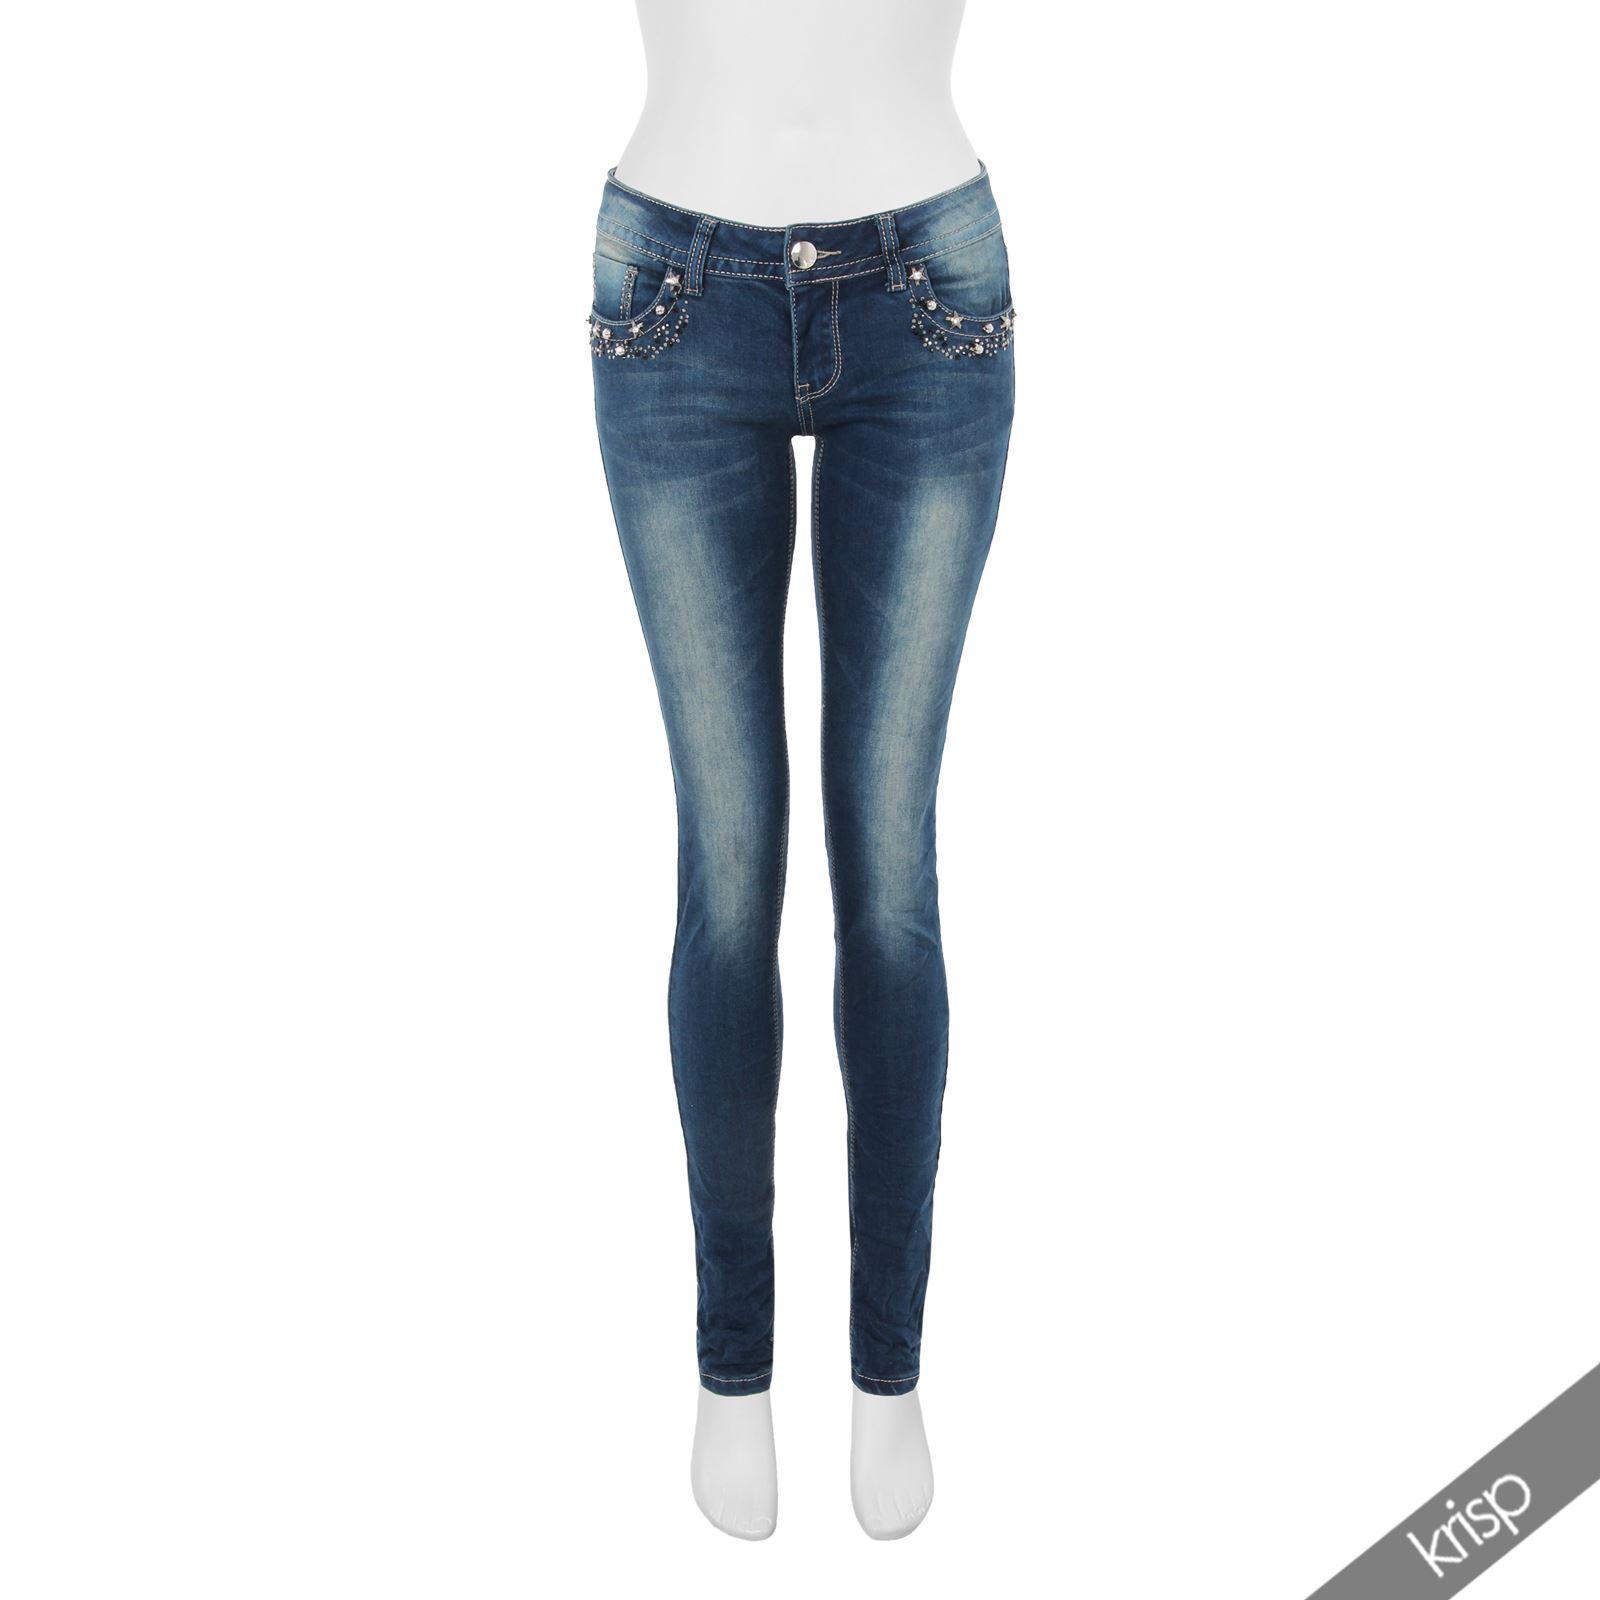 SALE Damen Jeans Hosen Slim Fit Skinny Stretch AUSVERKAUF ...